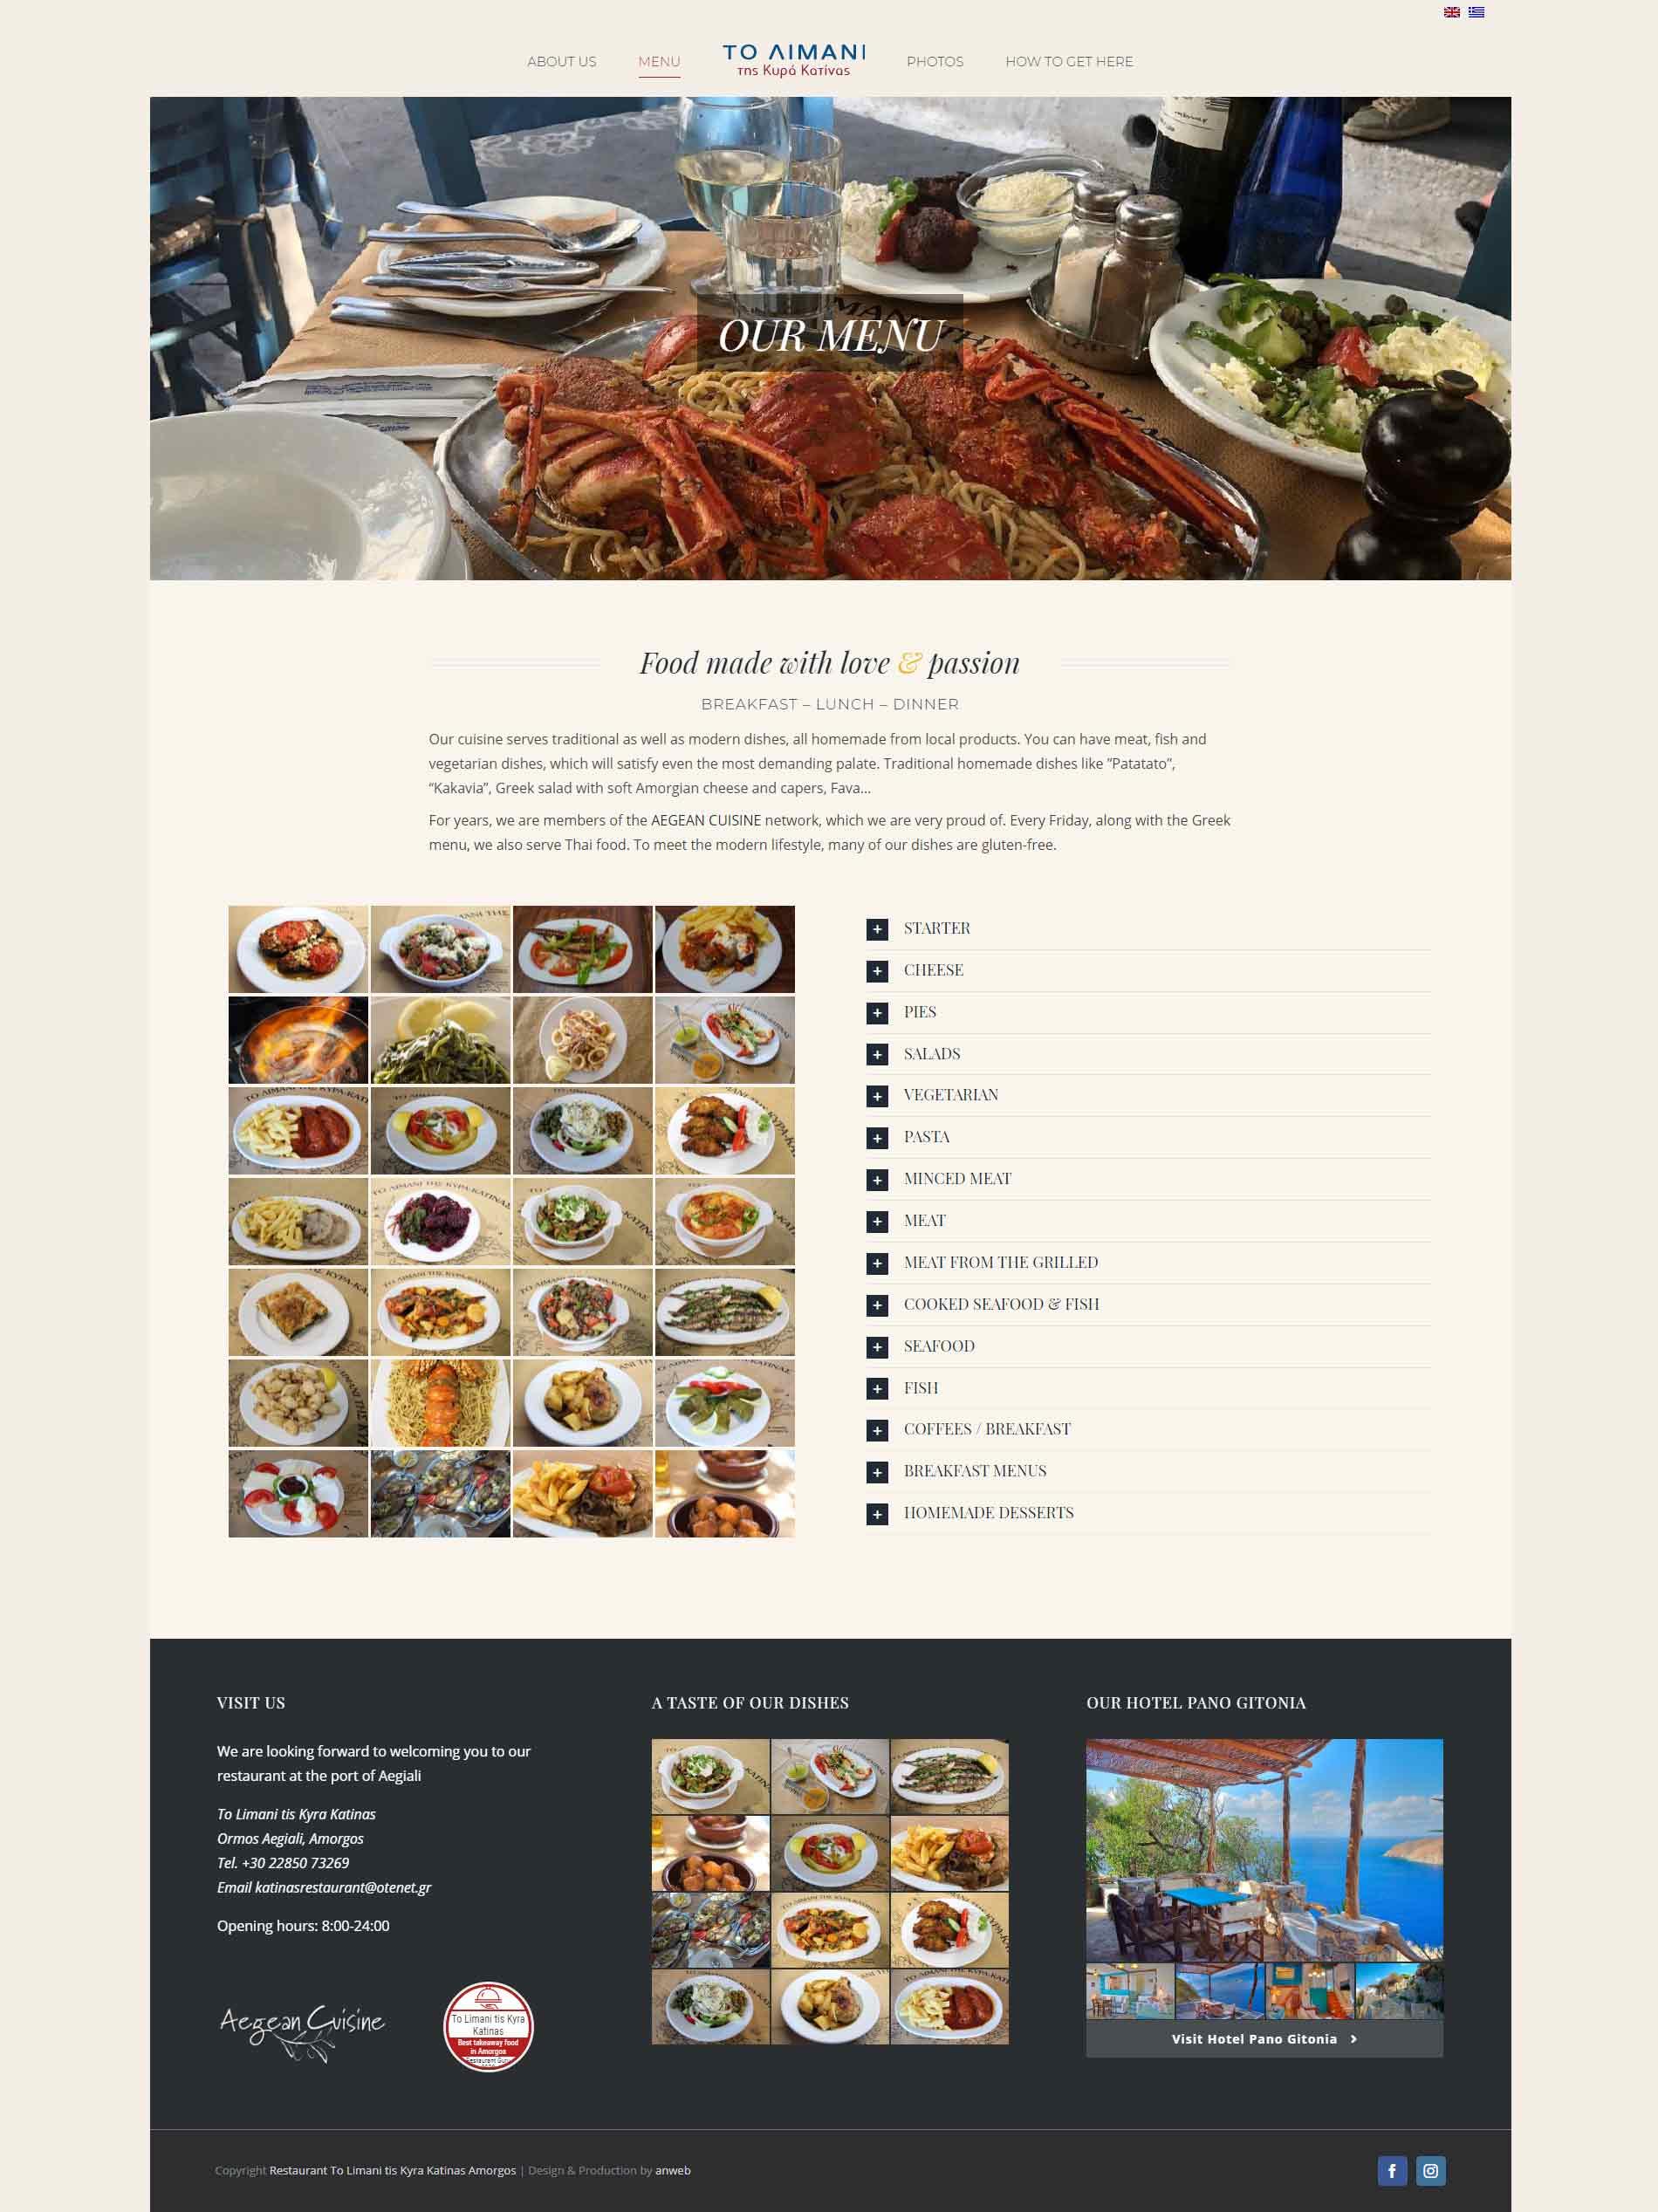 Web design anweb To Limani tis Kyra Katinas